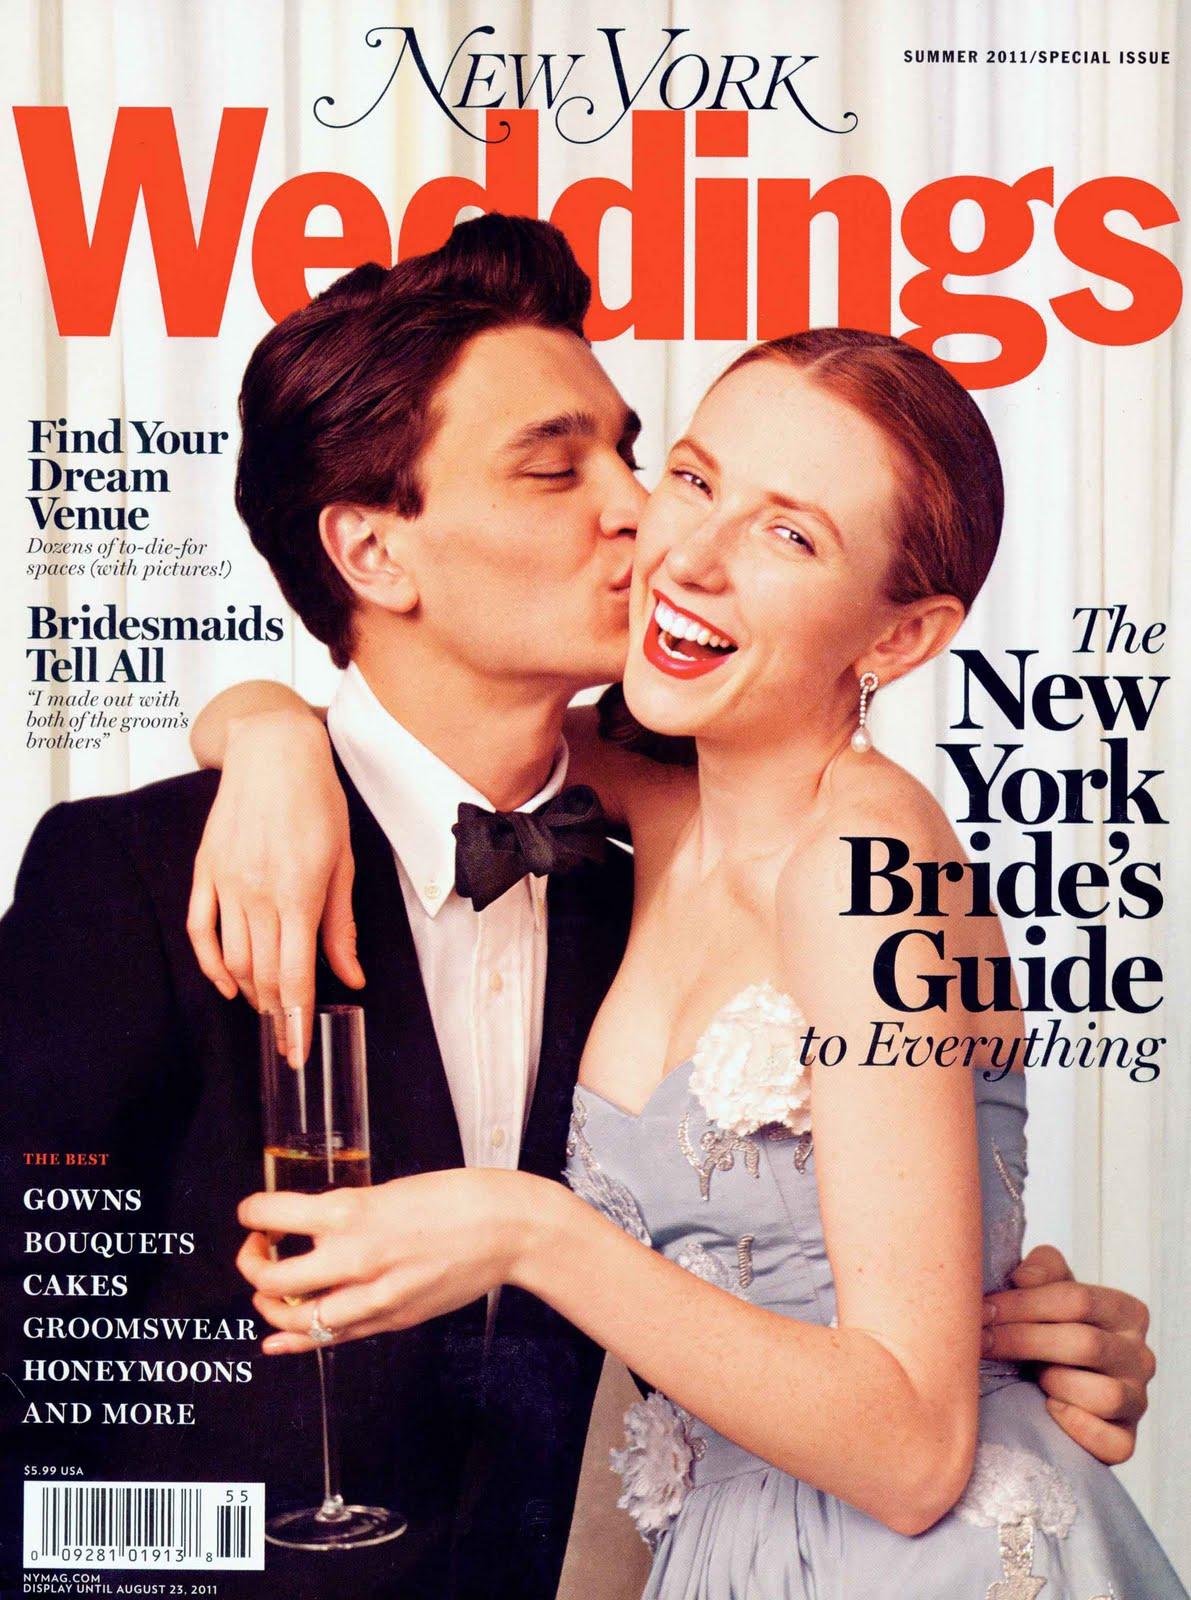 NY-MAG-WEDDINGS-C_web.jpg